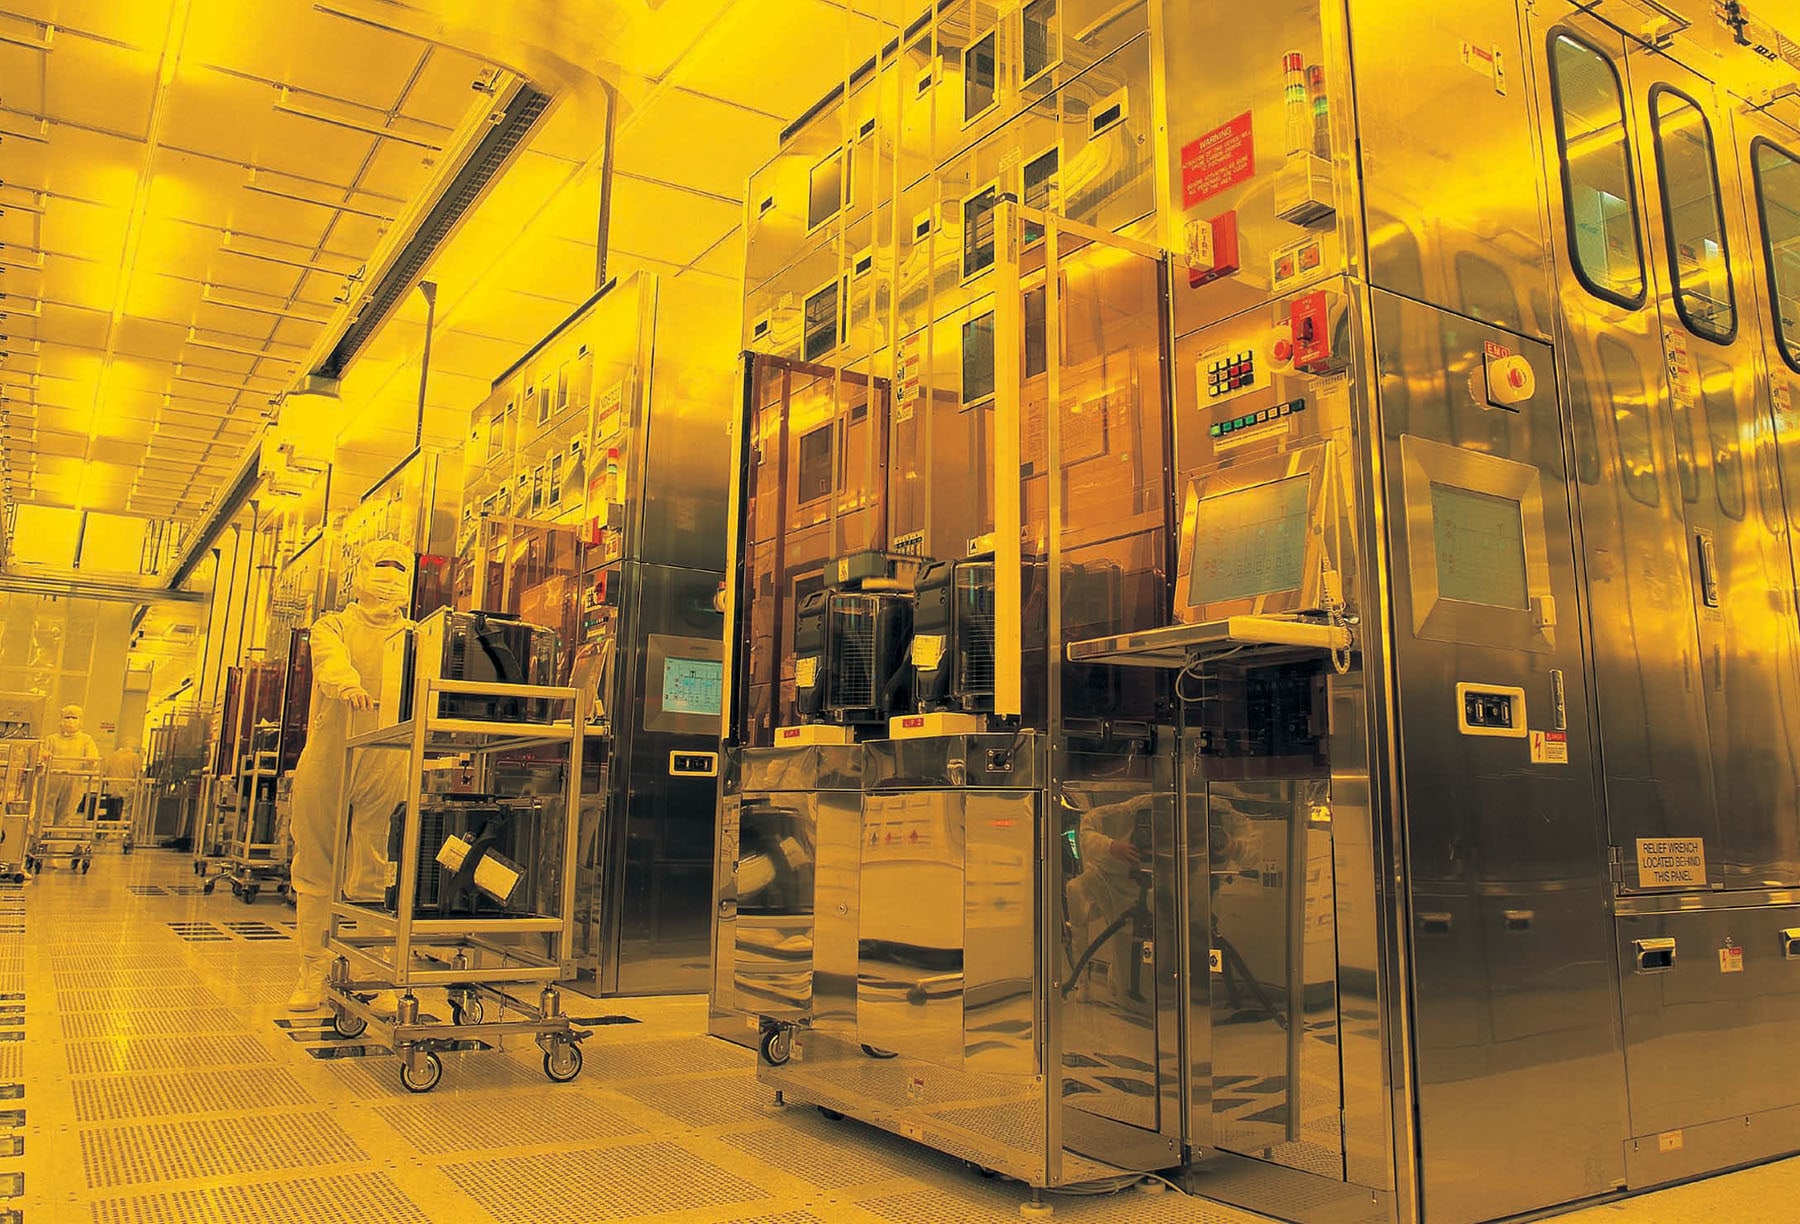 Apple chip-maker TSMC is building a $12 billion plant in Arizona ...